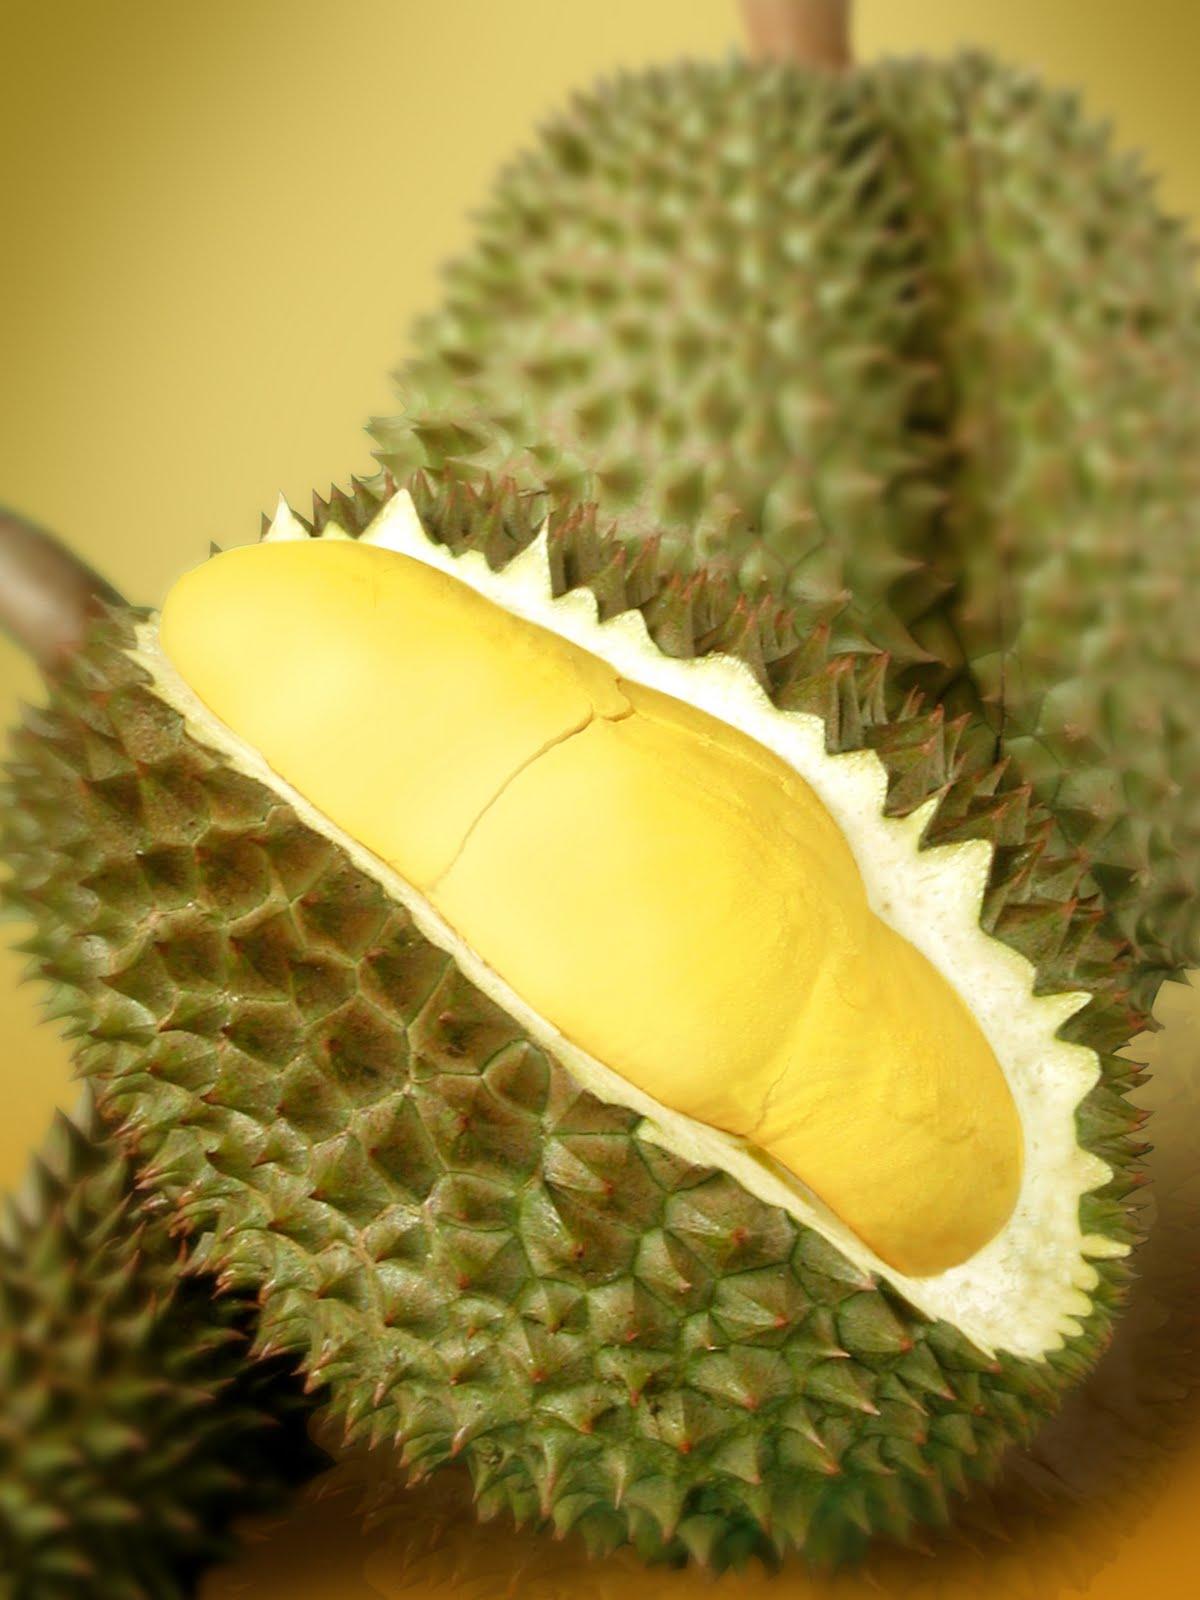 Durian adalah buah favorite yang sangat luar biasa. Buah durian dengan rasa manis dan bau yang sangat wangi. Uenak tenan, durian emang buah yang sangat luar biasanya enak banget. jika ada yang bilang buah durian itu menjijikan itu merupakan hal yang sangat keliru sekali. Durian mempunyai banyak jenis antara lain durian montong, durian merah dll.